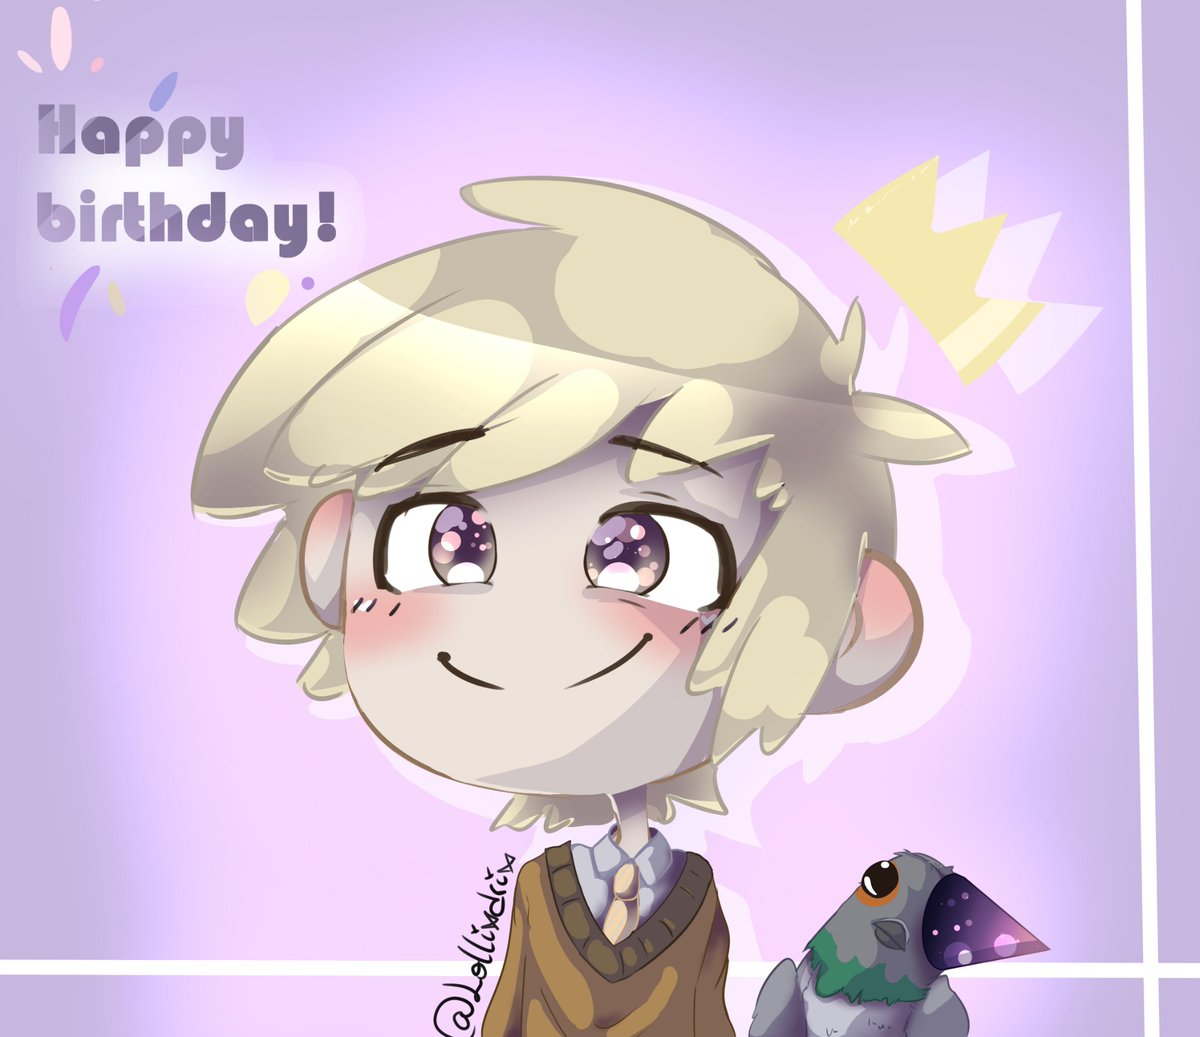 Feliz cumpleaños al pantene-lámpara-Golden boy~ ~°~ ~°~ @edd00chan  #FNAFHS #GoldenFNAFHS #Golden #Guillermito #birthday #happybirthday #cumpleaños #edd00chan